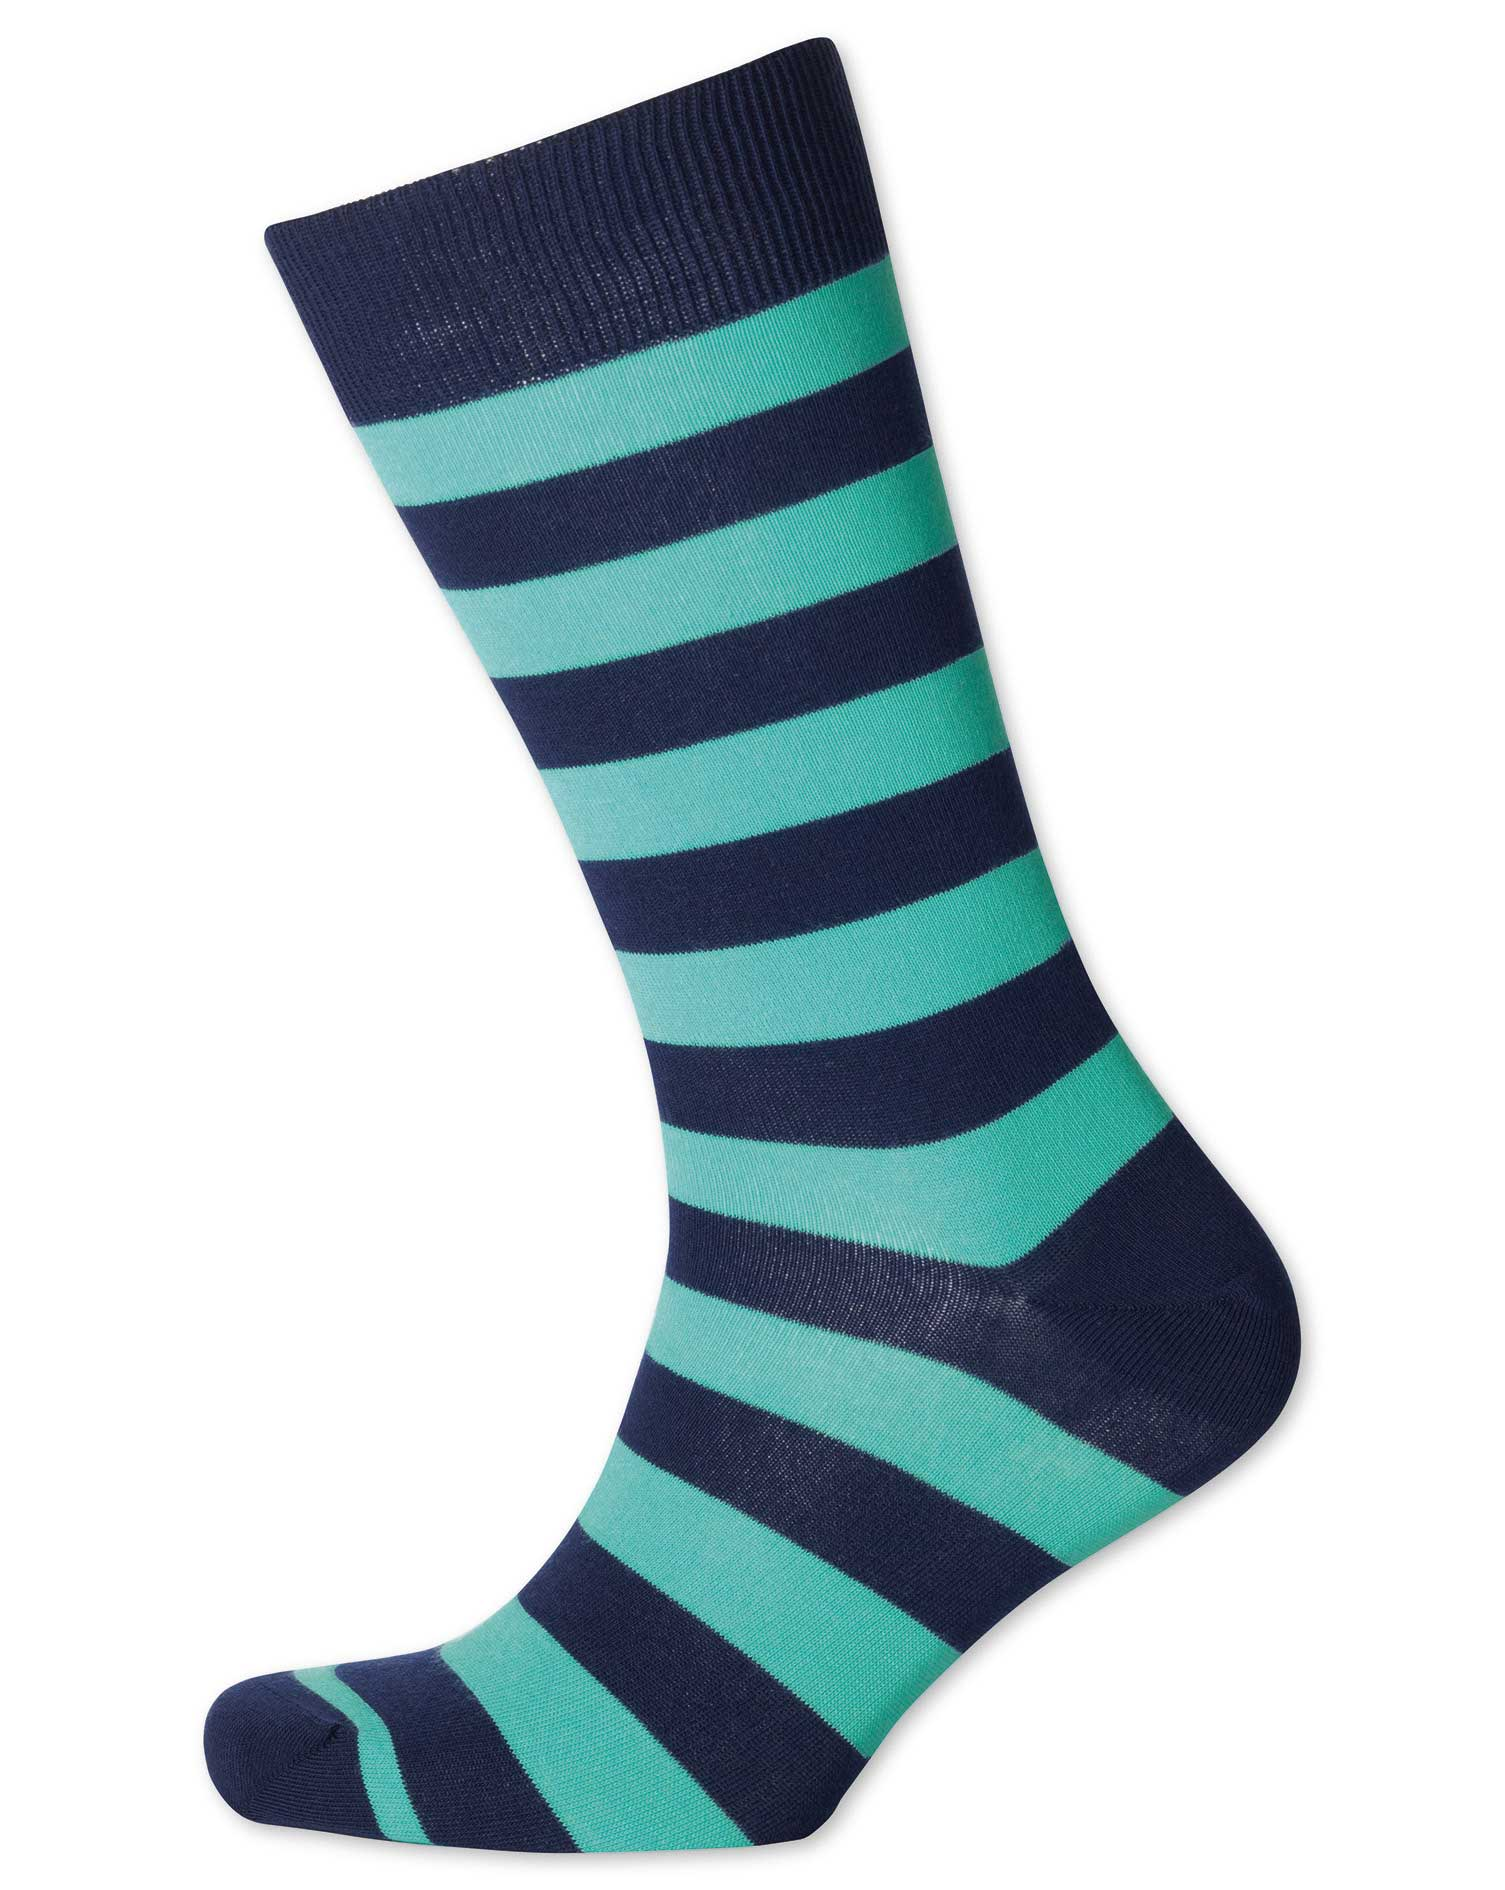 Mint and Navy Wide Stripe Socks Size Medium by Charles Tyrwhitt